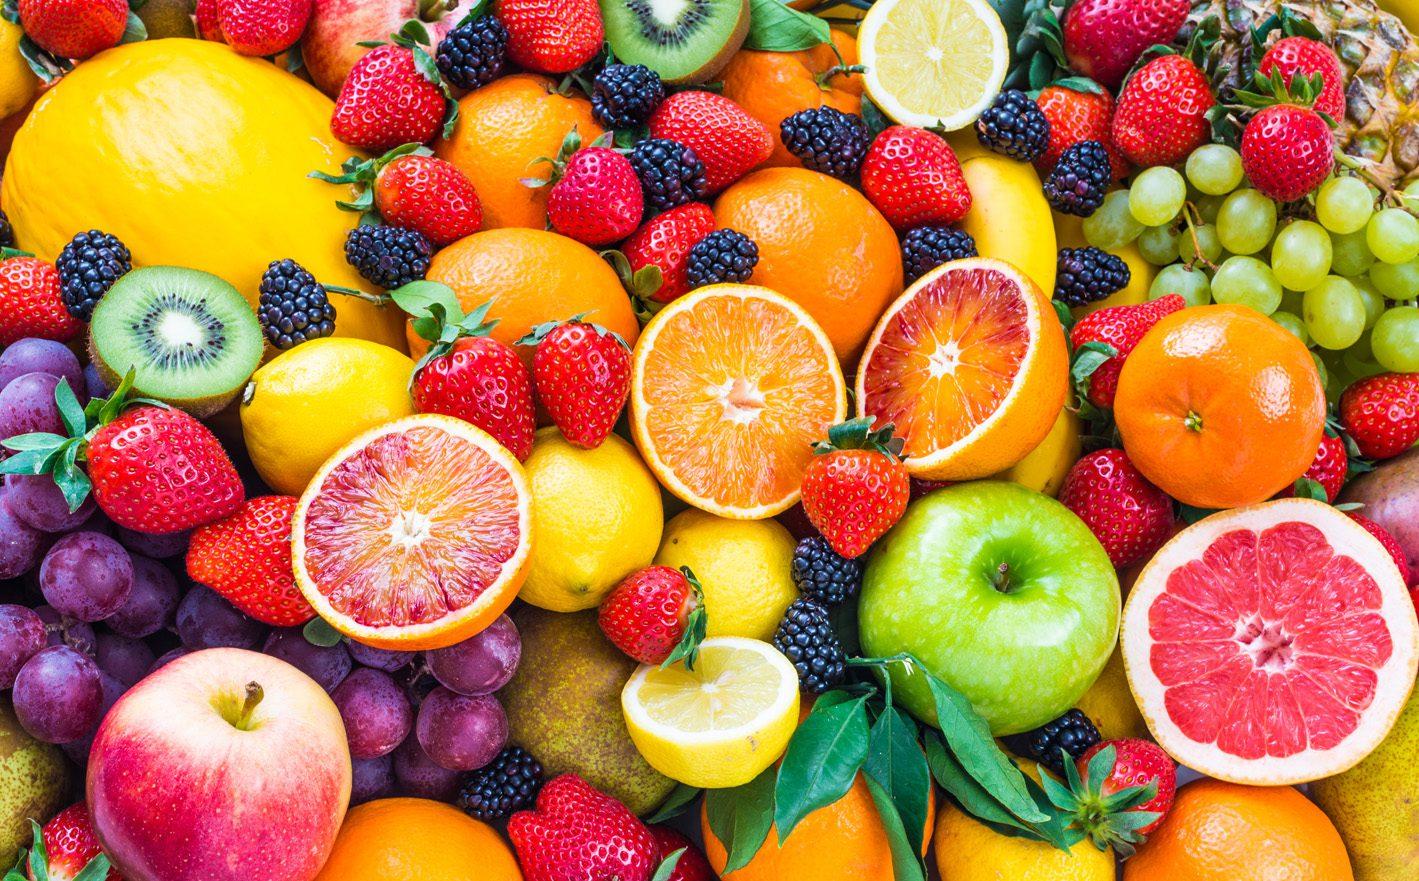 tasty juicy alliesthetic fruits